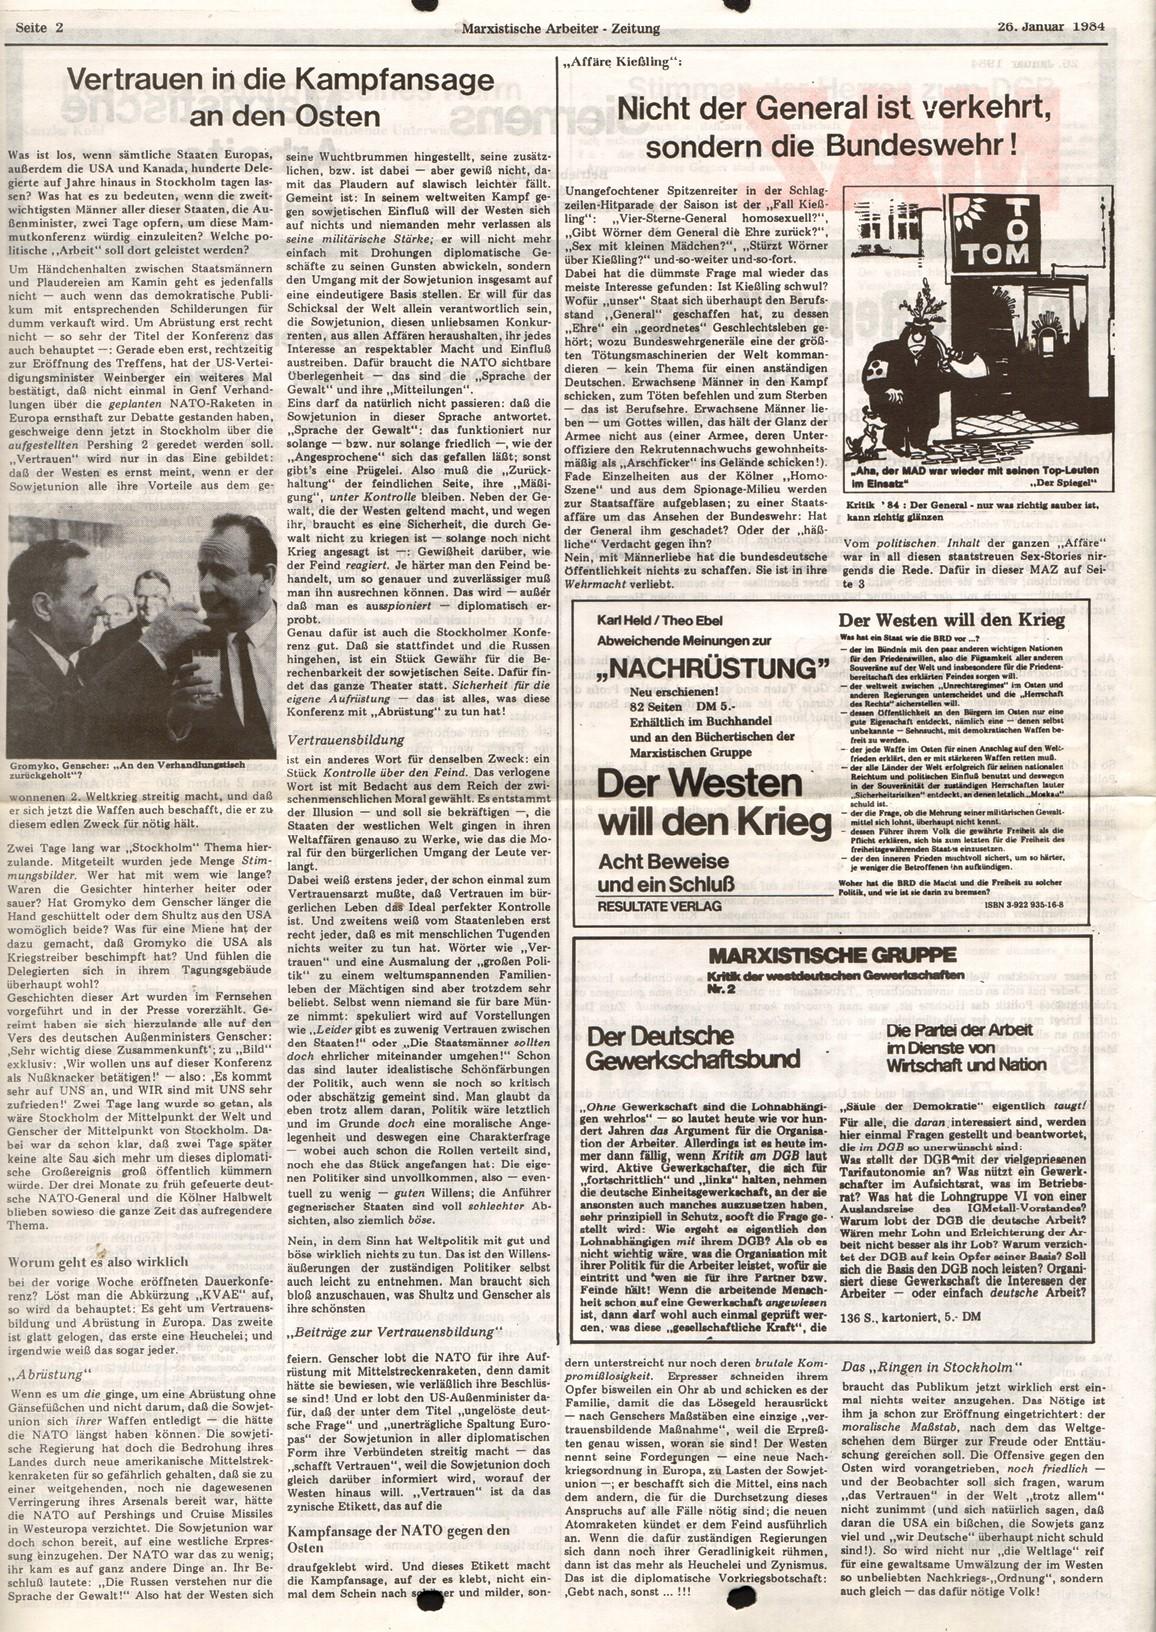 Muenchen_MG_MAZ_Siemens_19840126_02